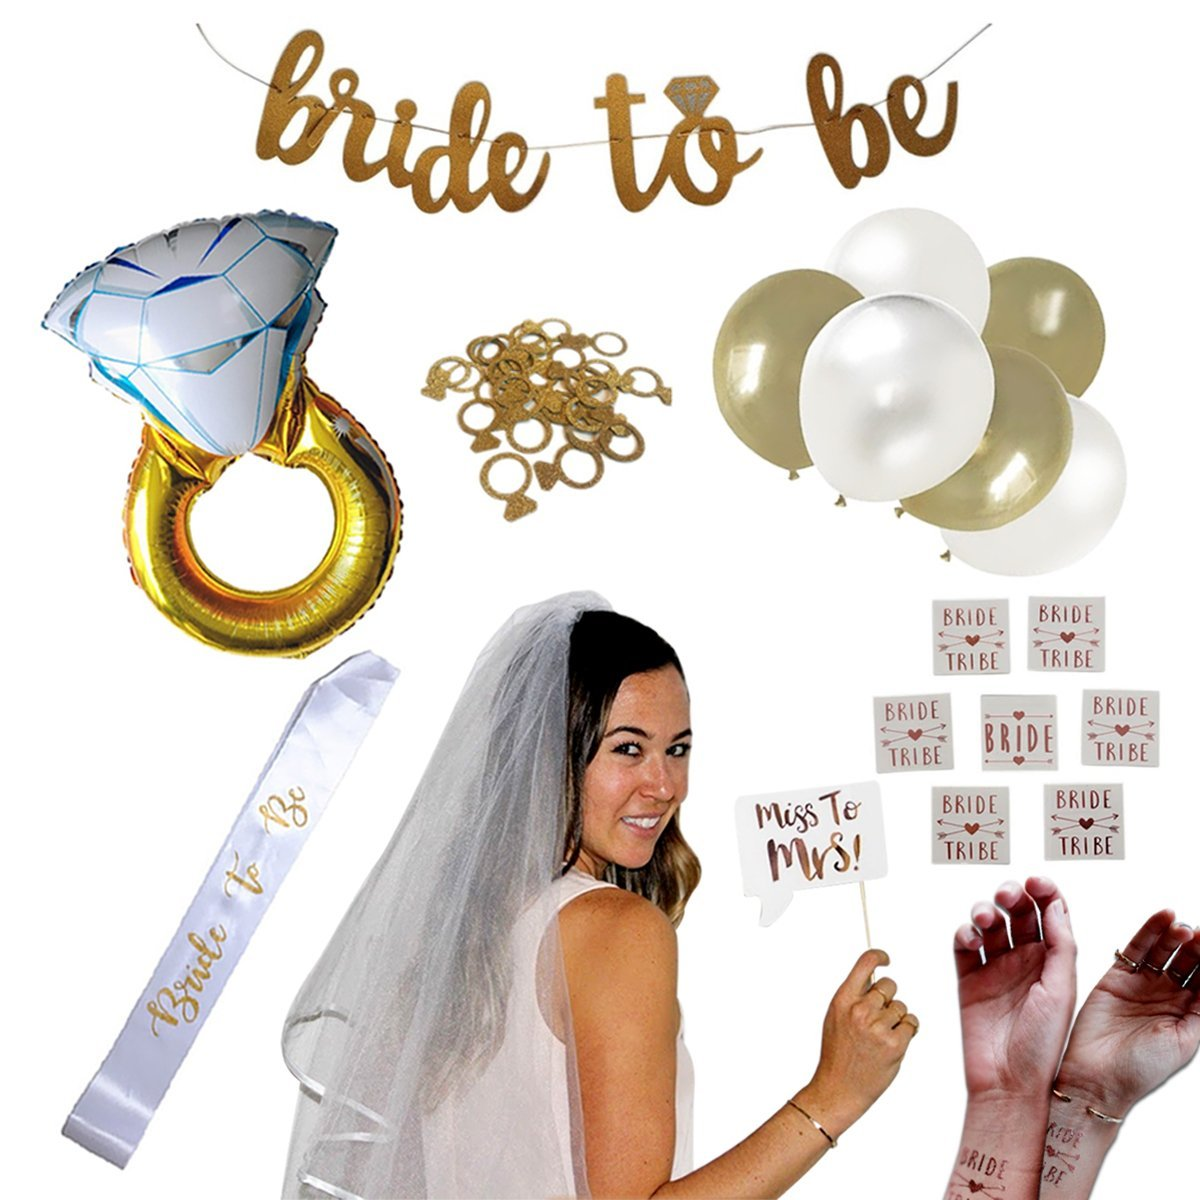 Complete Bachelorette Party + Bridal Shower Decoration Set! Supplies Incl. Ring Foil Balloon, Bride Tribe Flash Tats, Bachelorette PhotoBooth Props, Gold Banner, Veil, Sash, Ring Confetti, Balloons